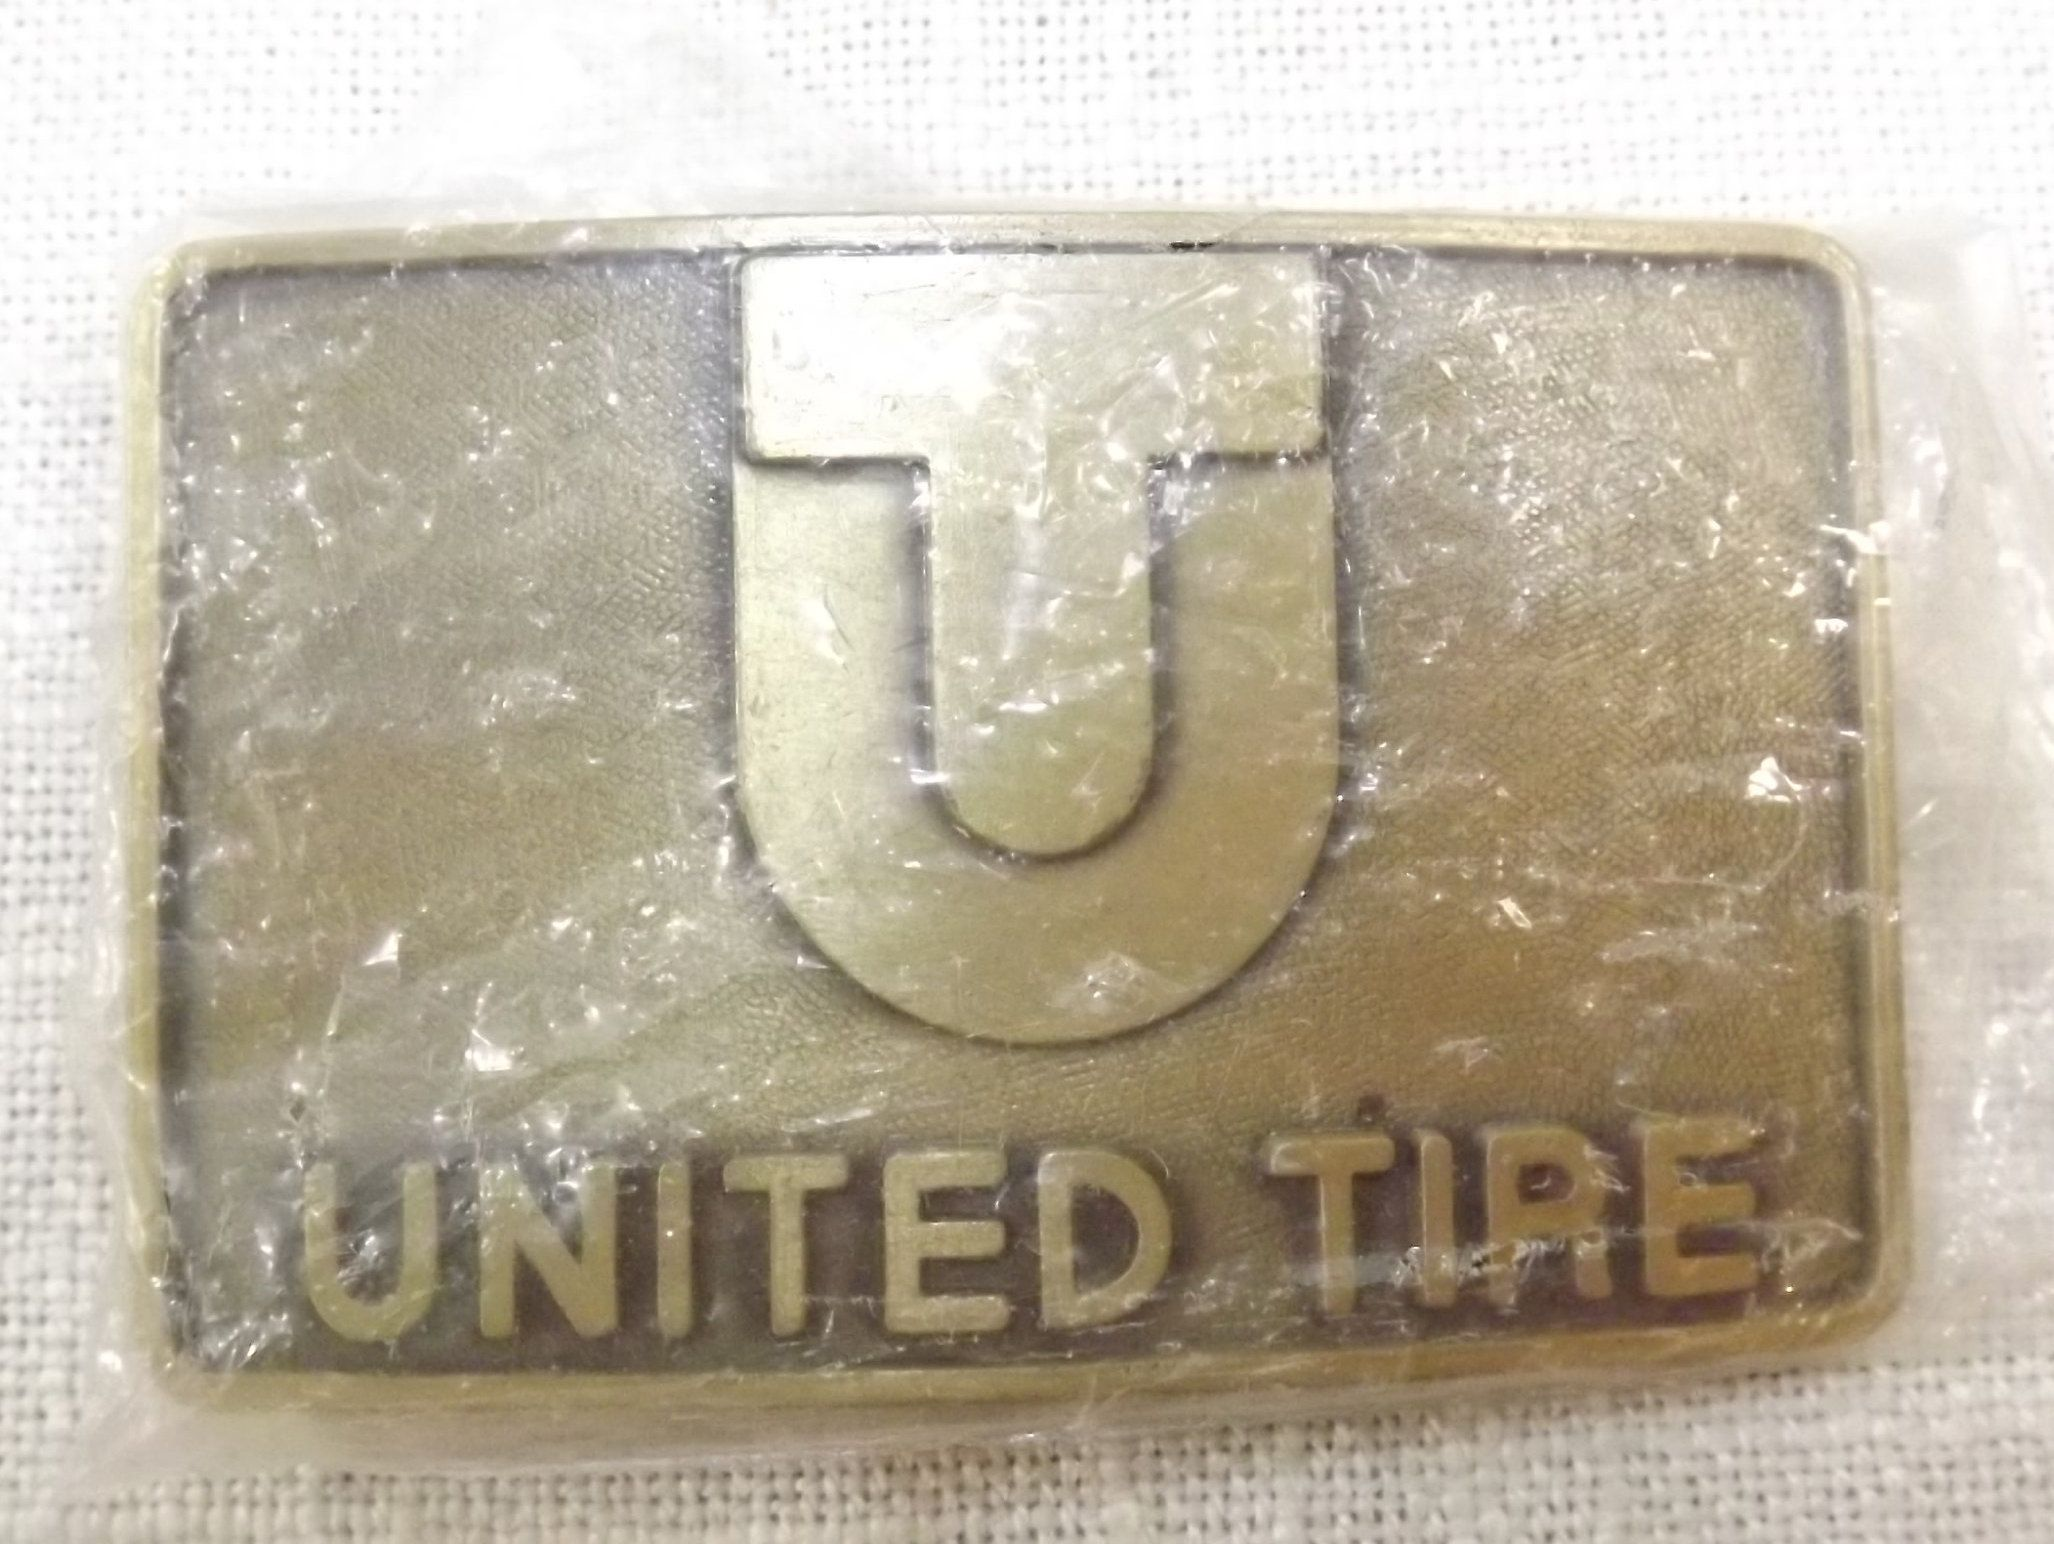 United Tire Belt Buckle, Vintage Heavy Equipment